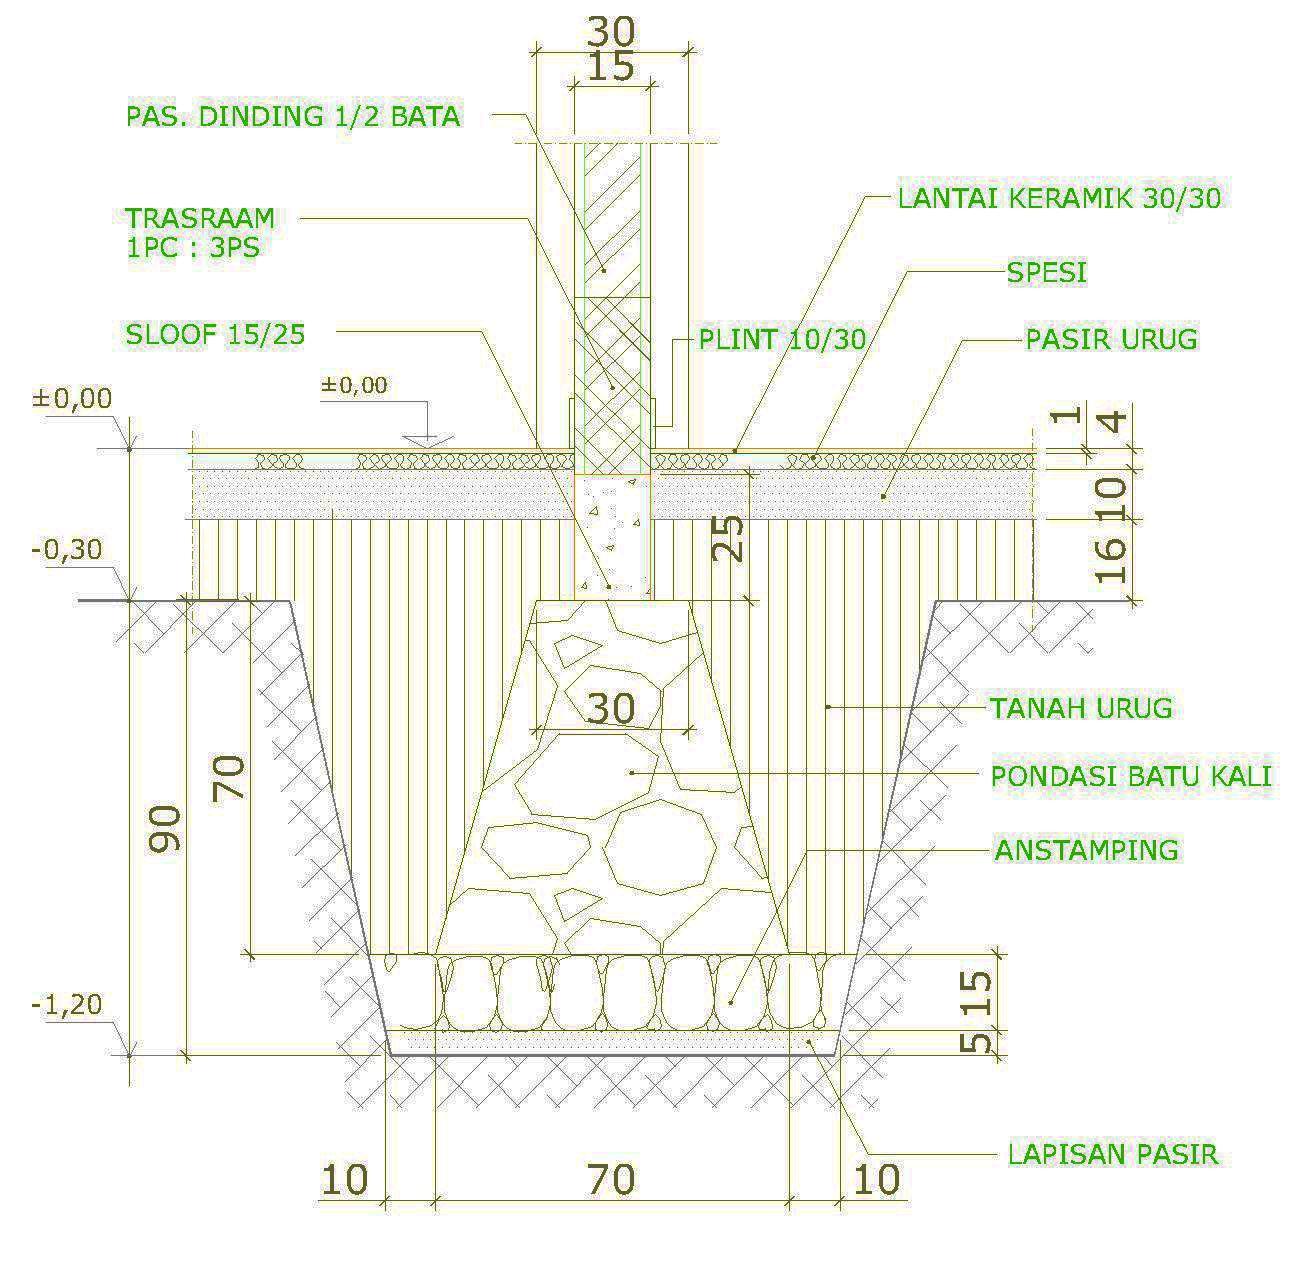 Image Result For Detail Pondasi Batu Kali Sketsa Arsitektur Arsitektur Gambar Arsitektur